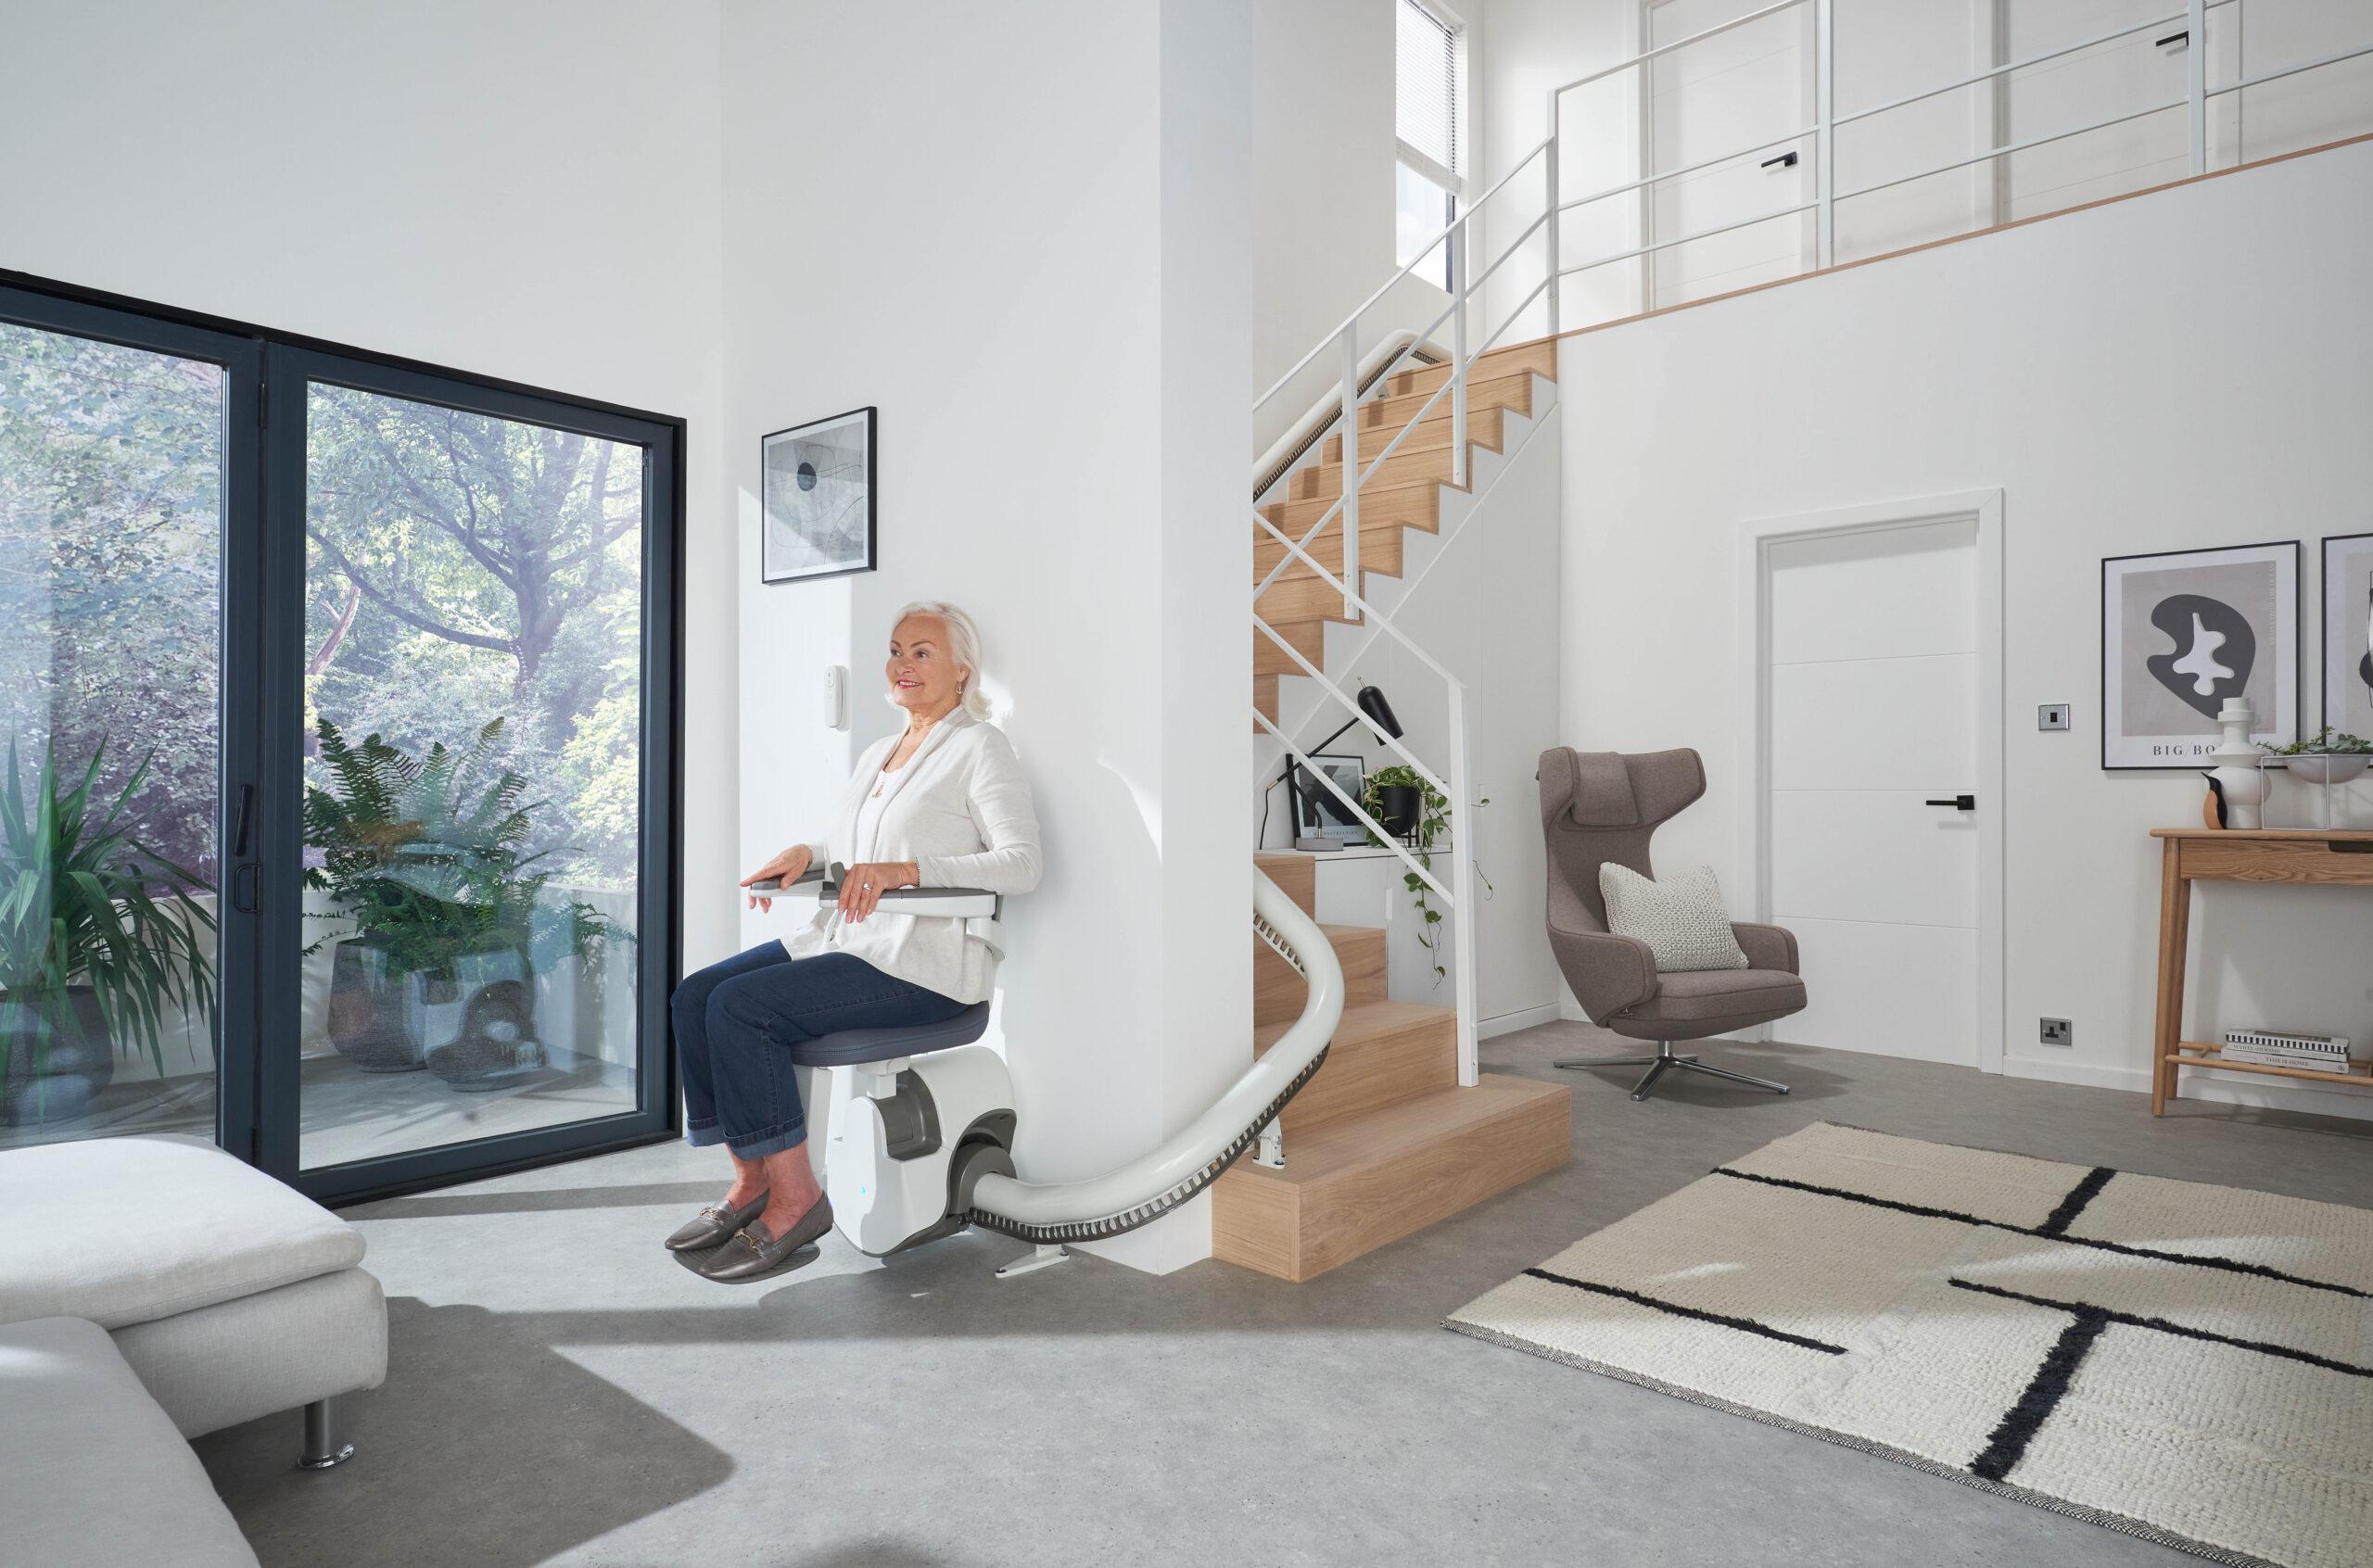 Monte-escalier Access BDD